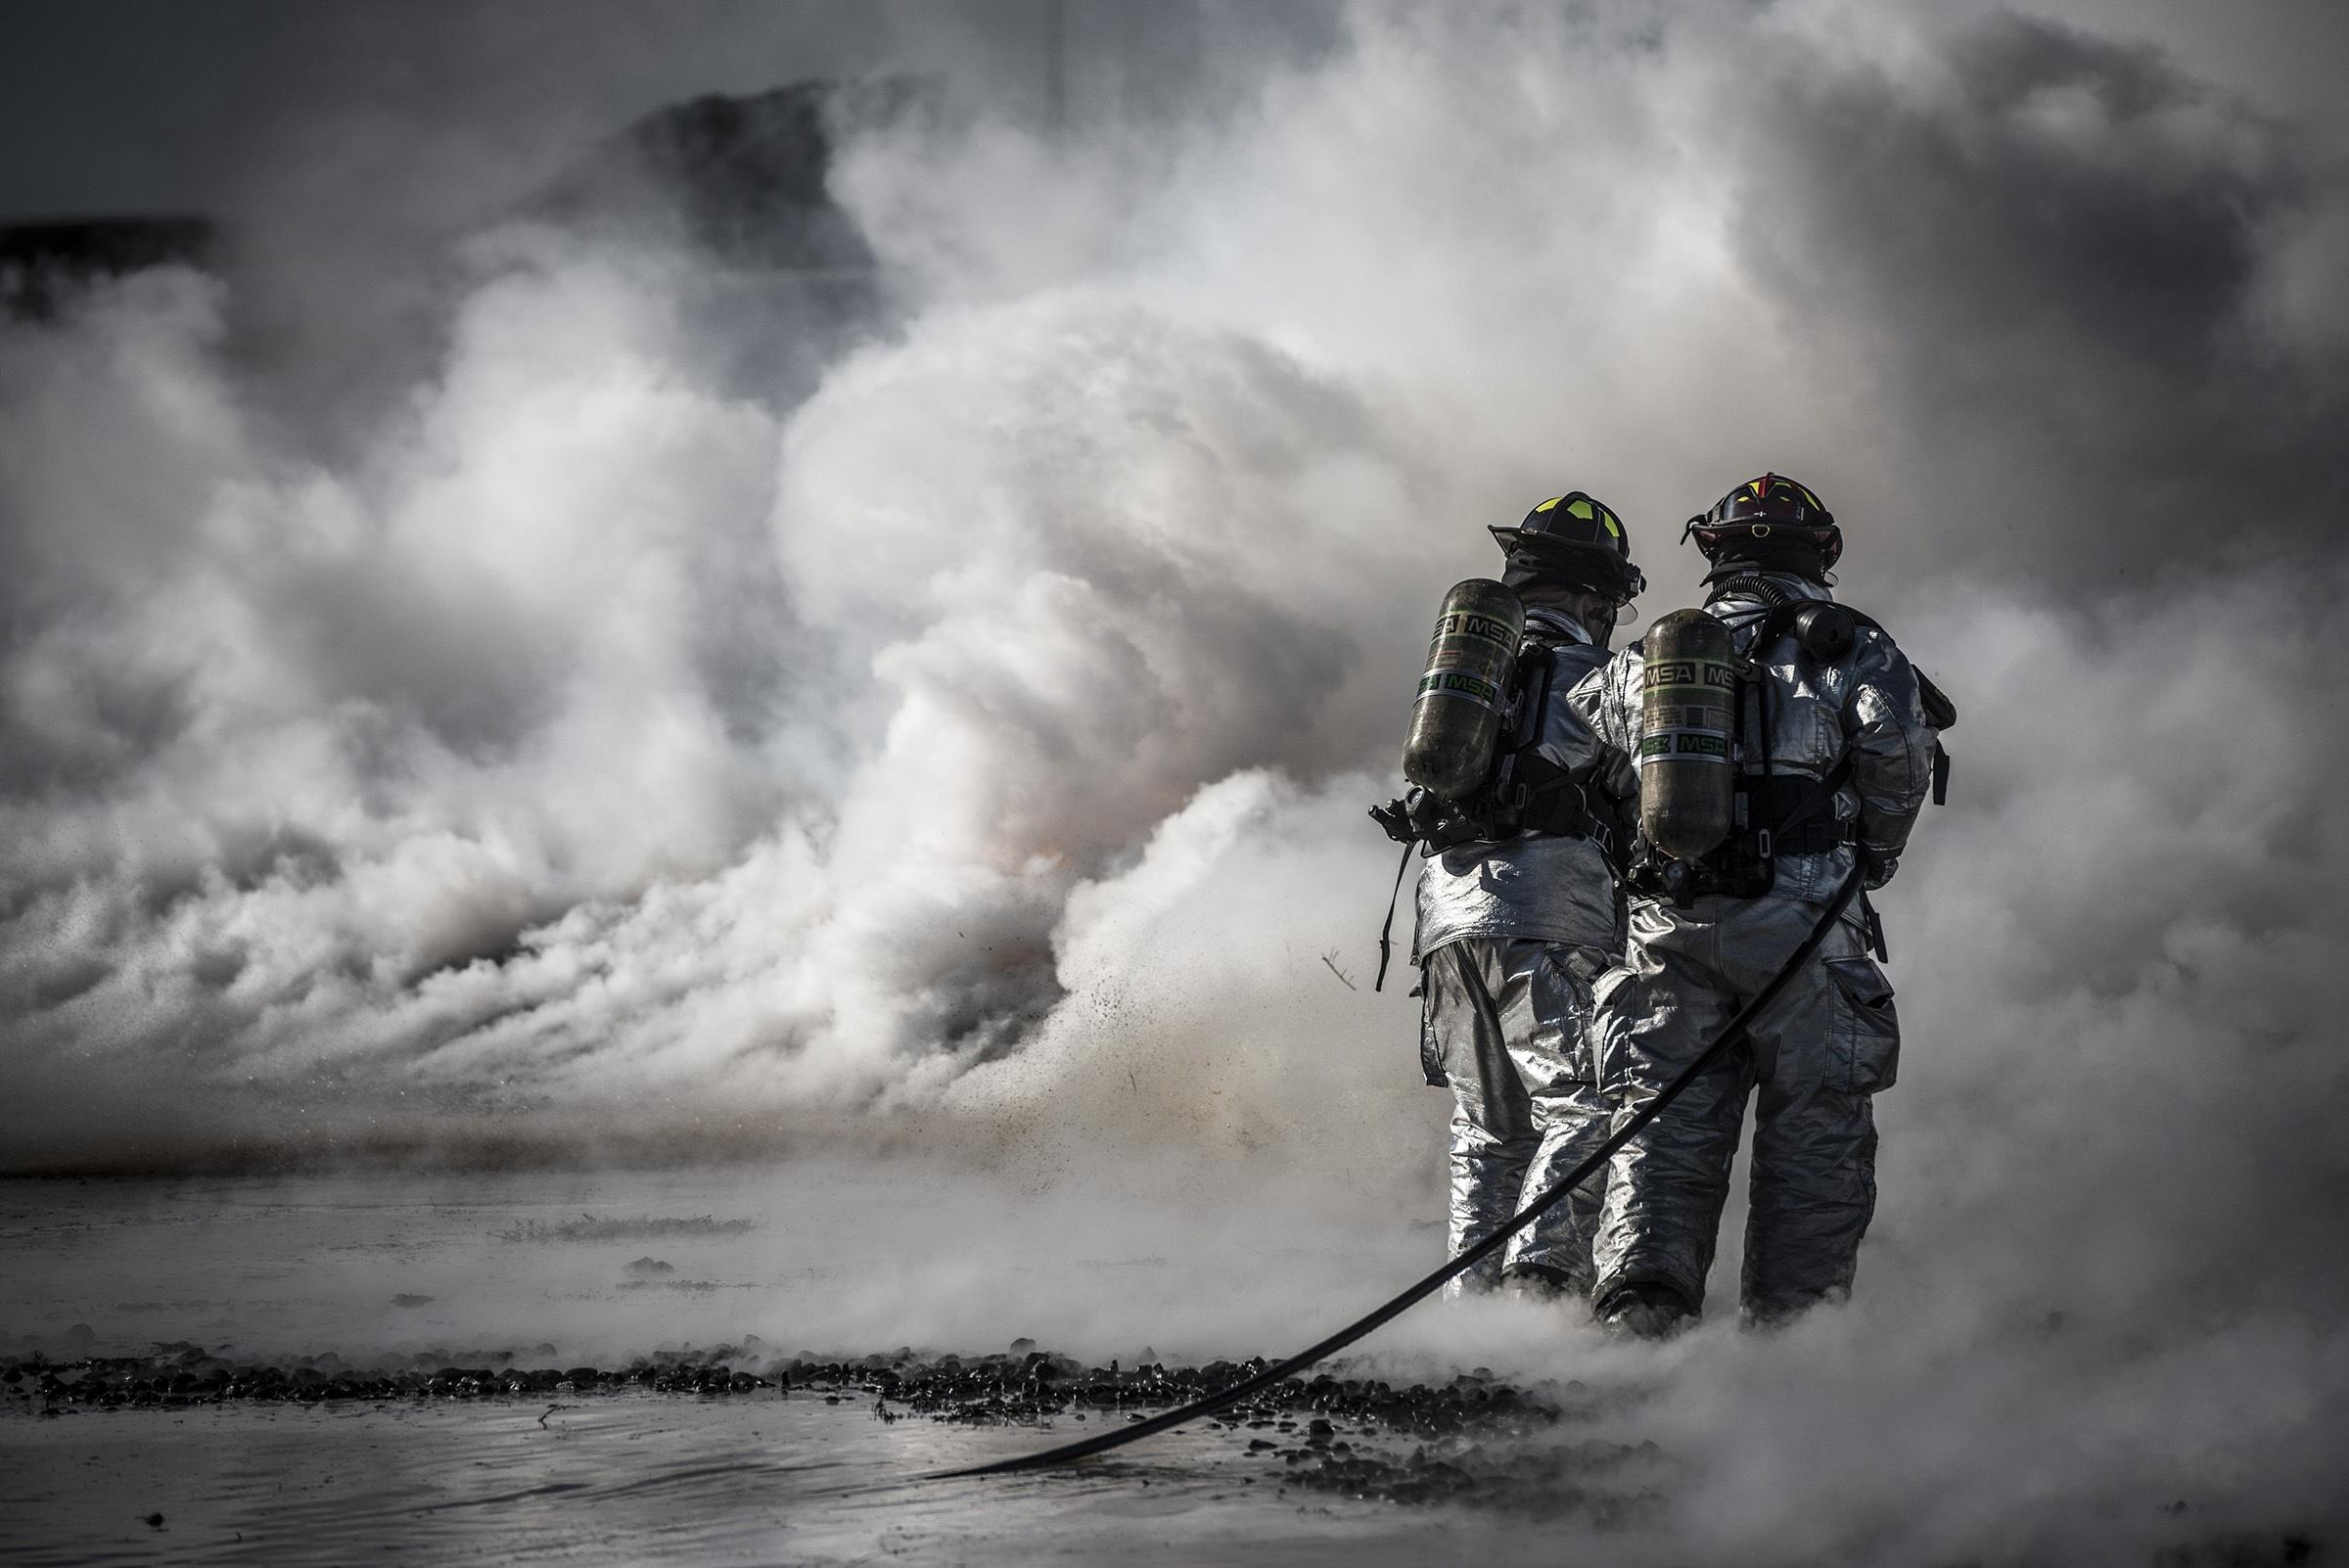 free stock photos of fireman pexels